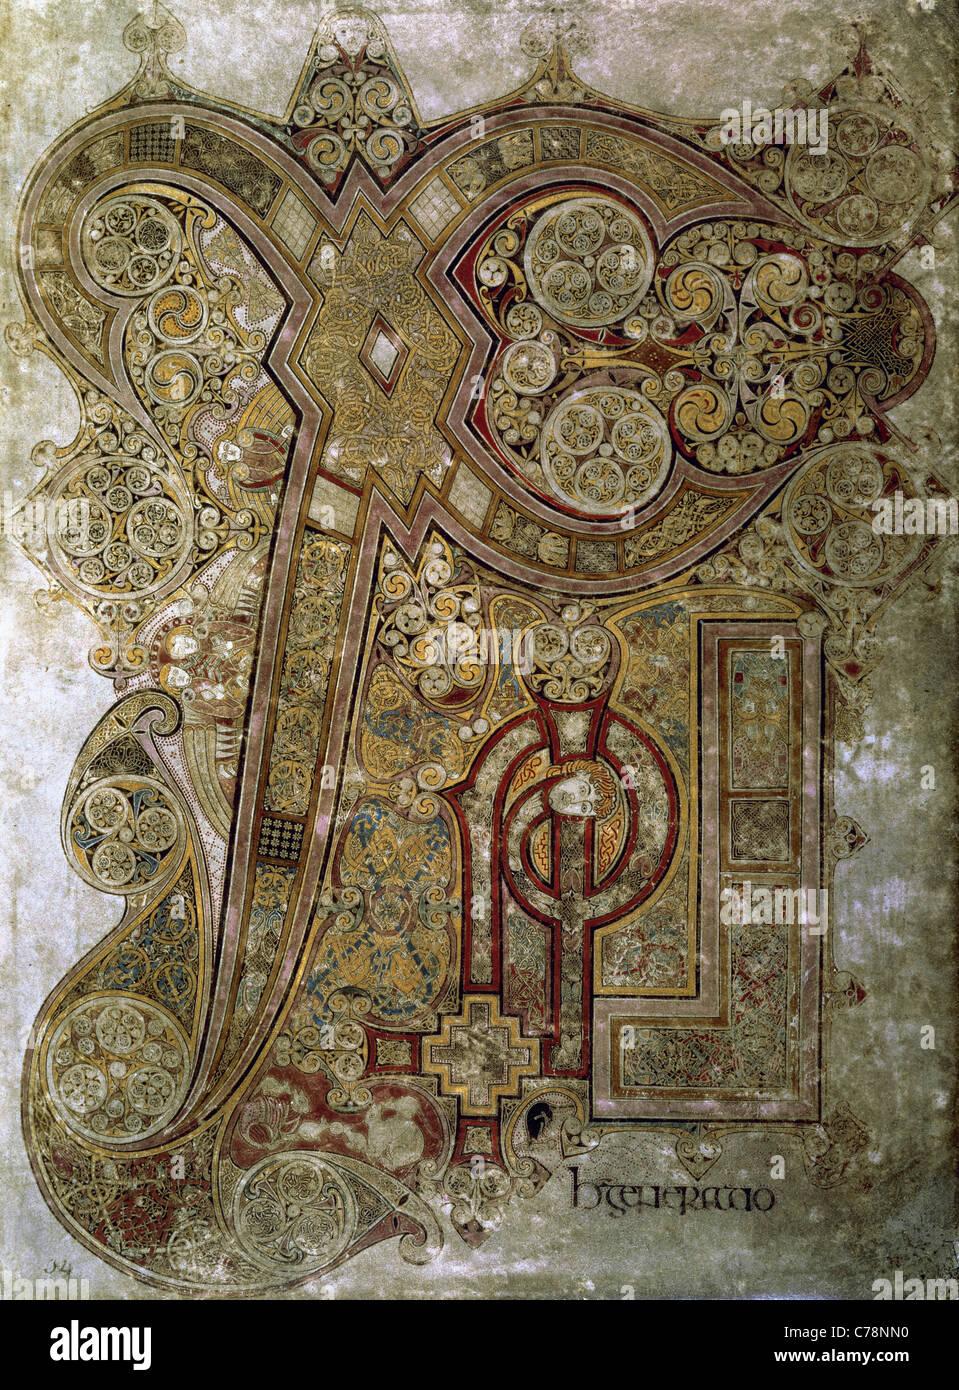 The Book of Kells. Chi Rho monogram. Folio 34r. 8th century. Trinity College Library. Dublin. Ireland. - Stock Image